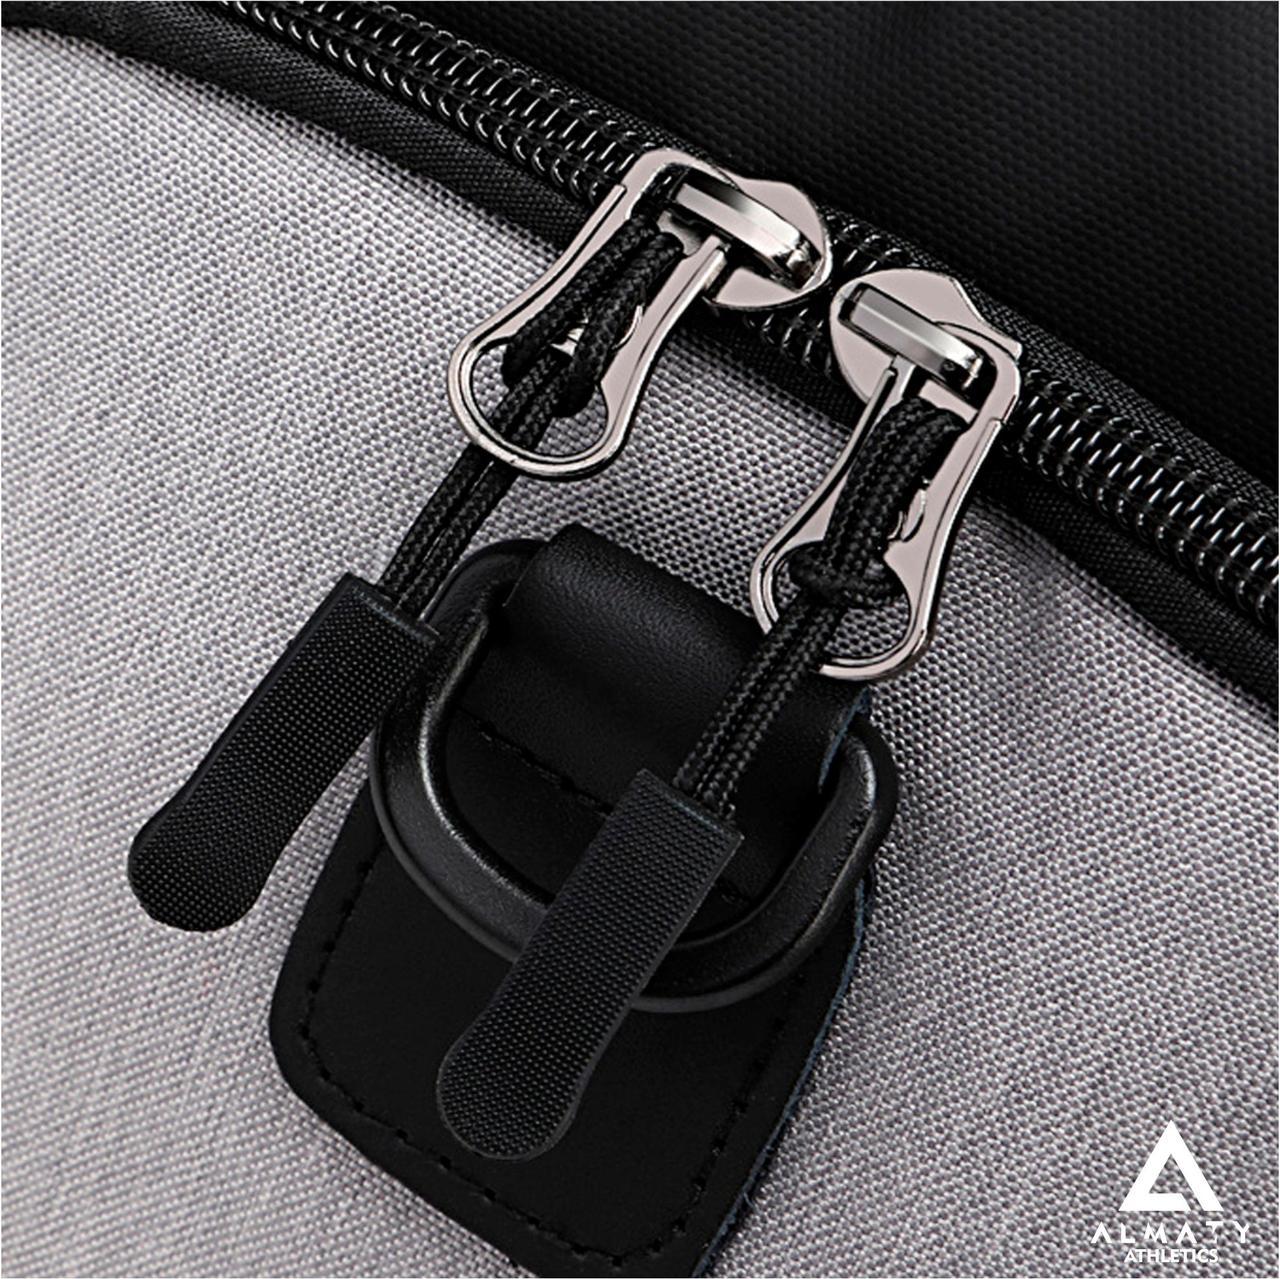 Дорожная сумка-портплед ALMATY ATHLETICS - фото 4